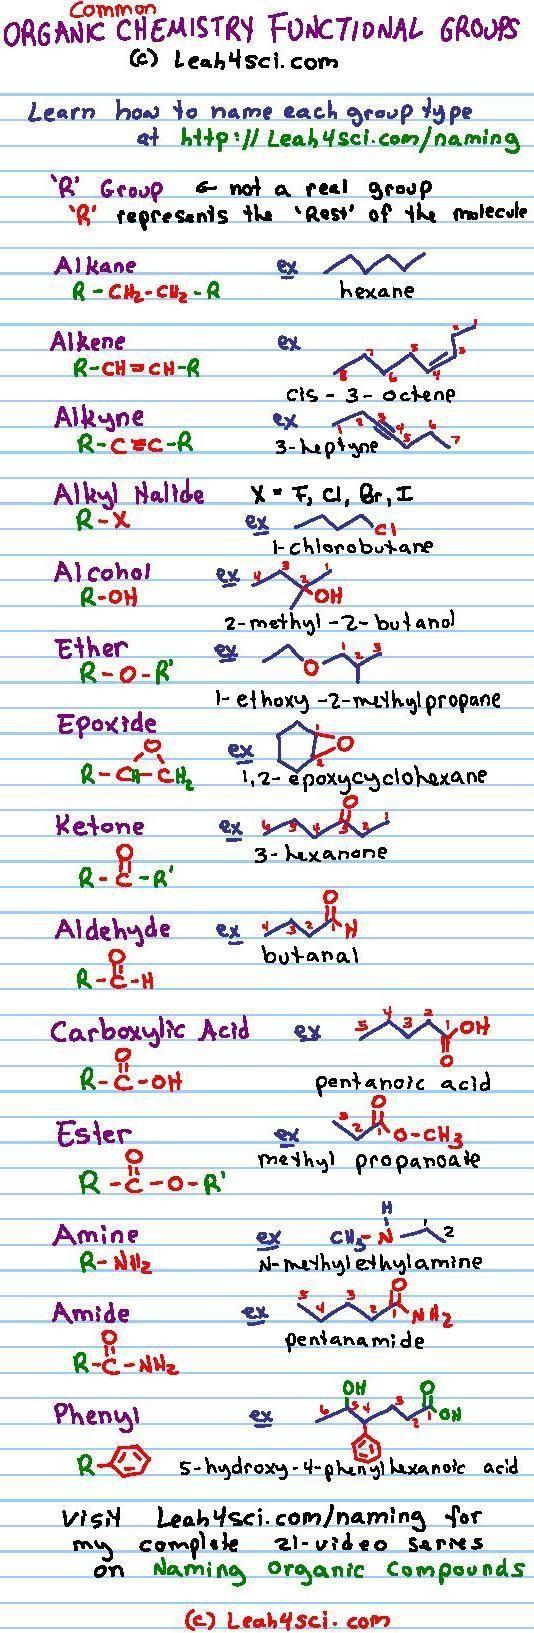 A Very Tiny Mini Not Really A Dump Dump Science Post Organic Chemistry Chemistry Science Education